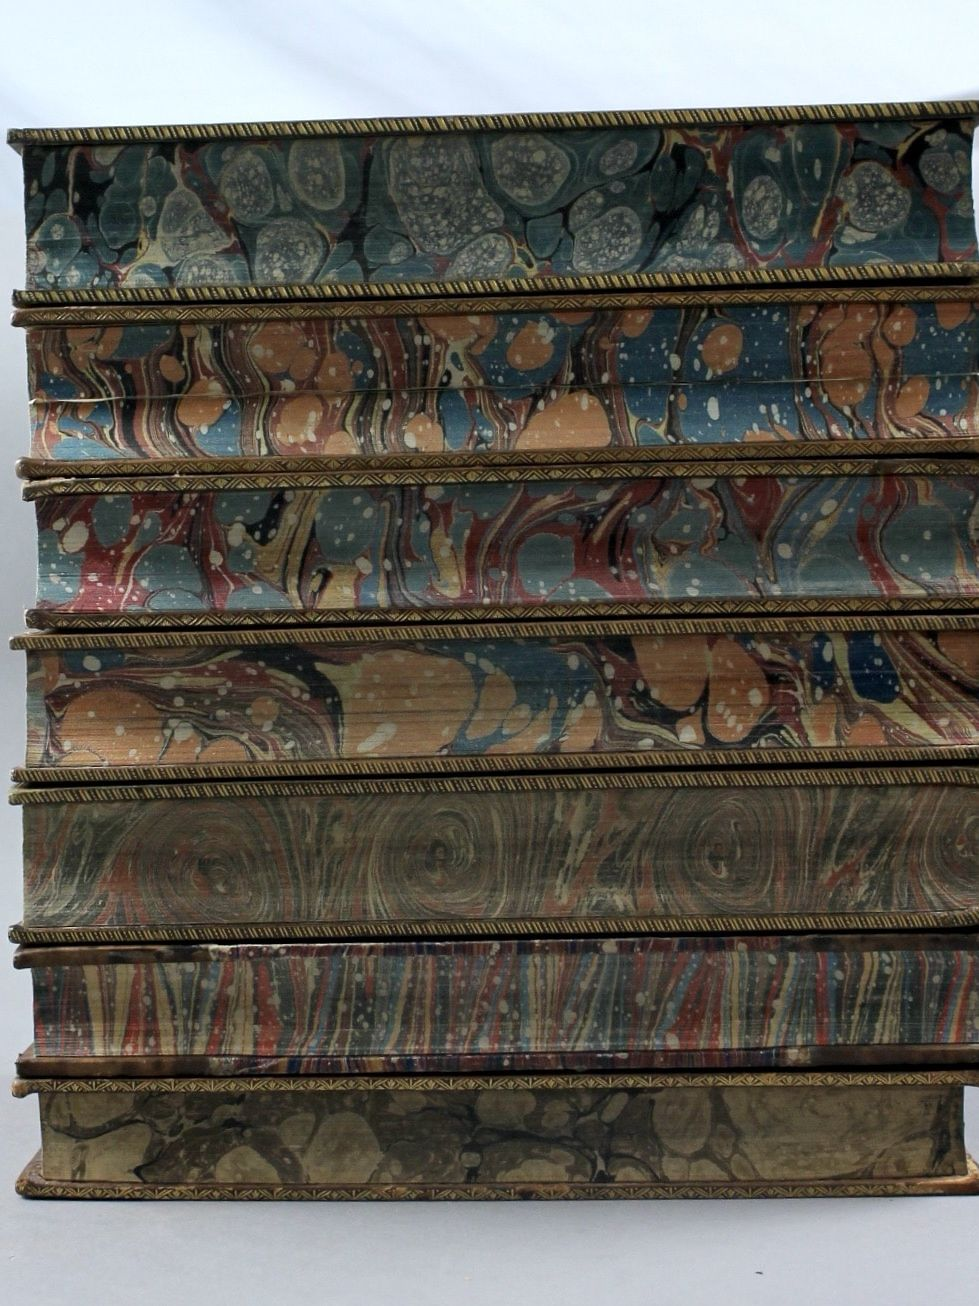 Tranches marbrées de livres anciens © Armagh Robinson Library